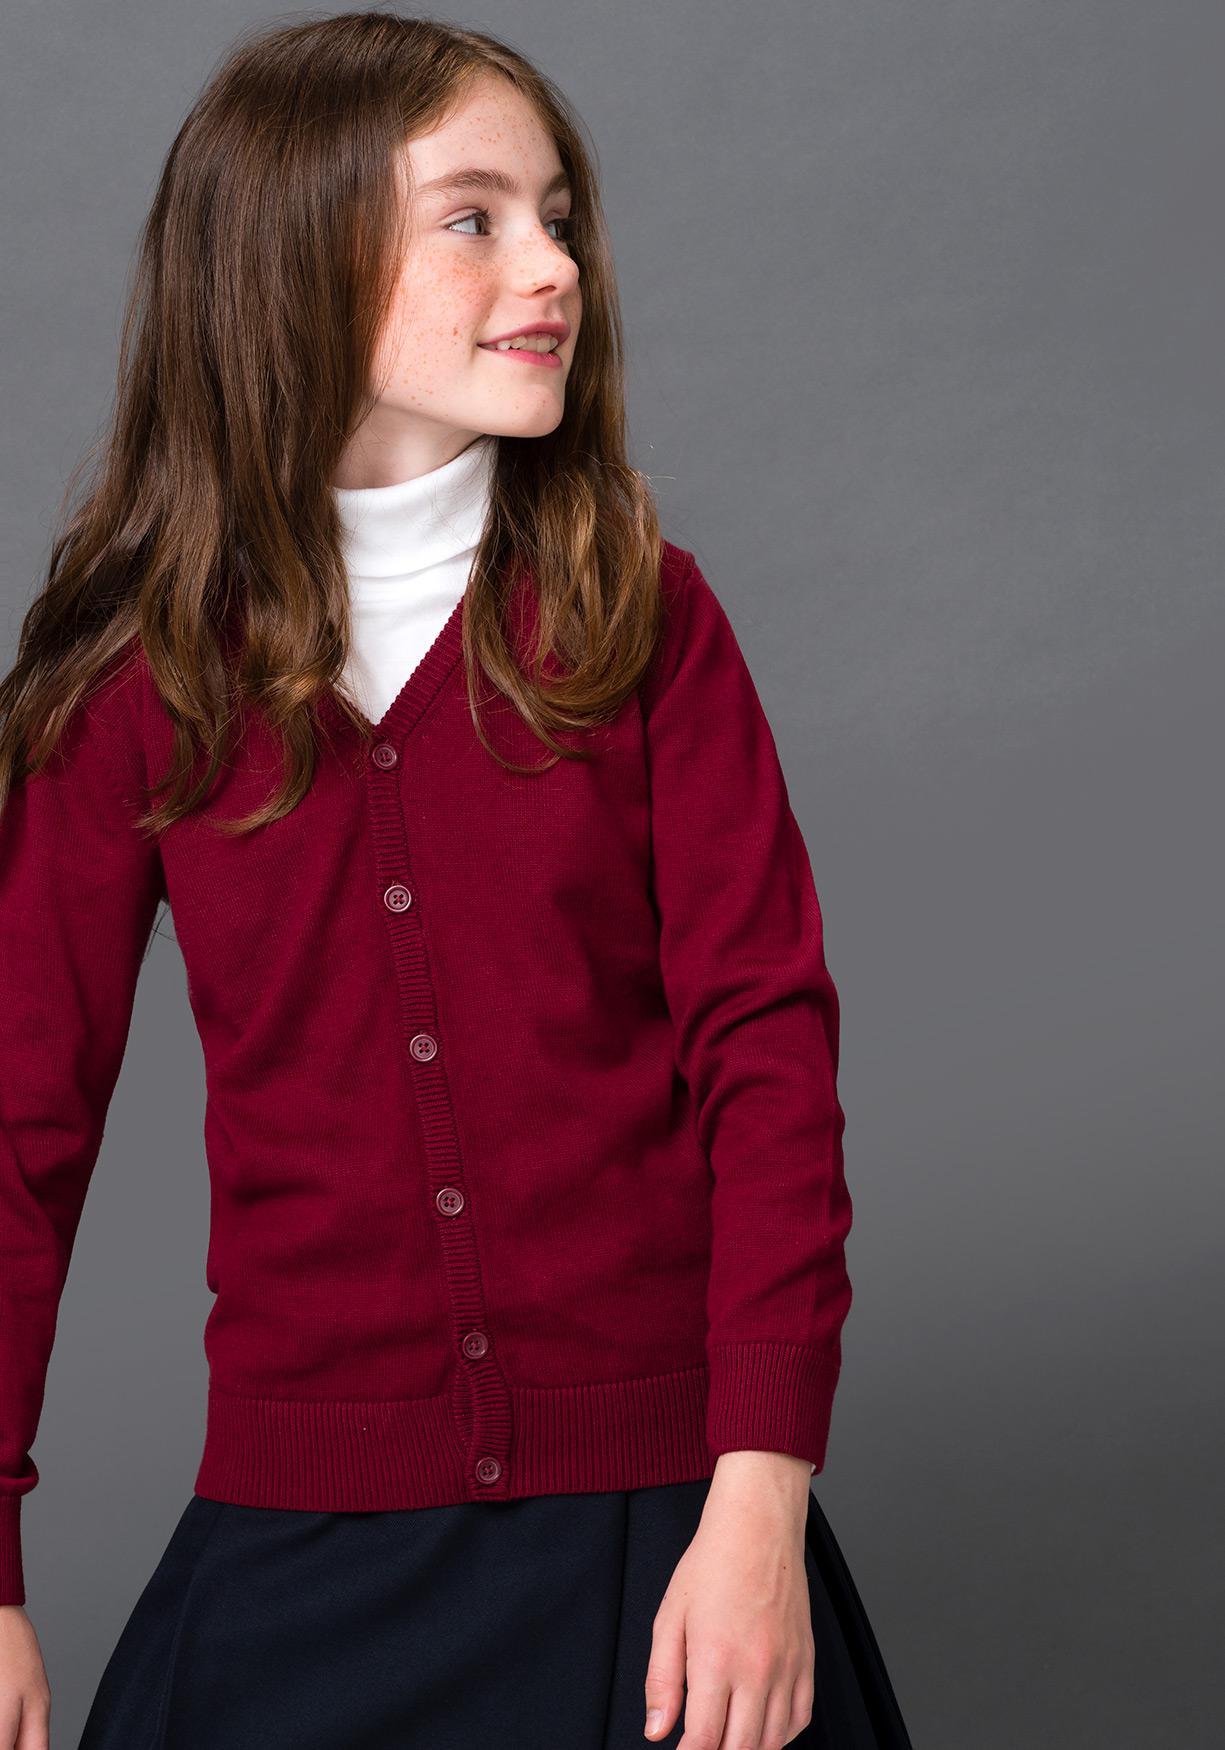 d29e994f07365 Comprar Chaqueta unisex de algodón para uniforme (tallas 3 a 16 años ...